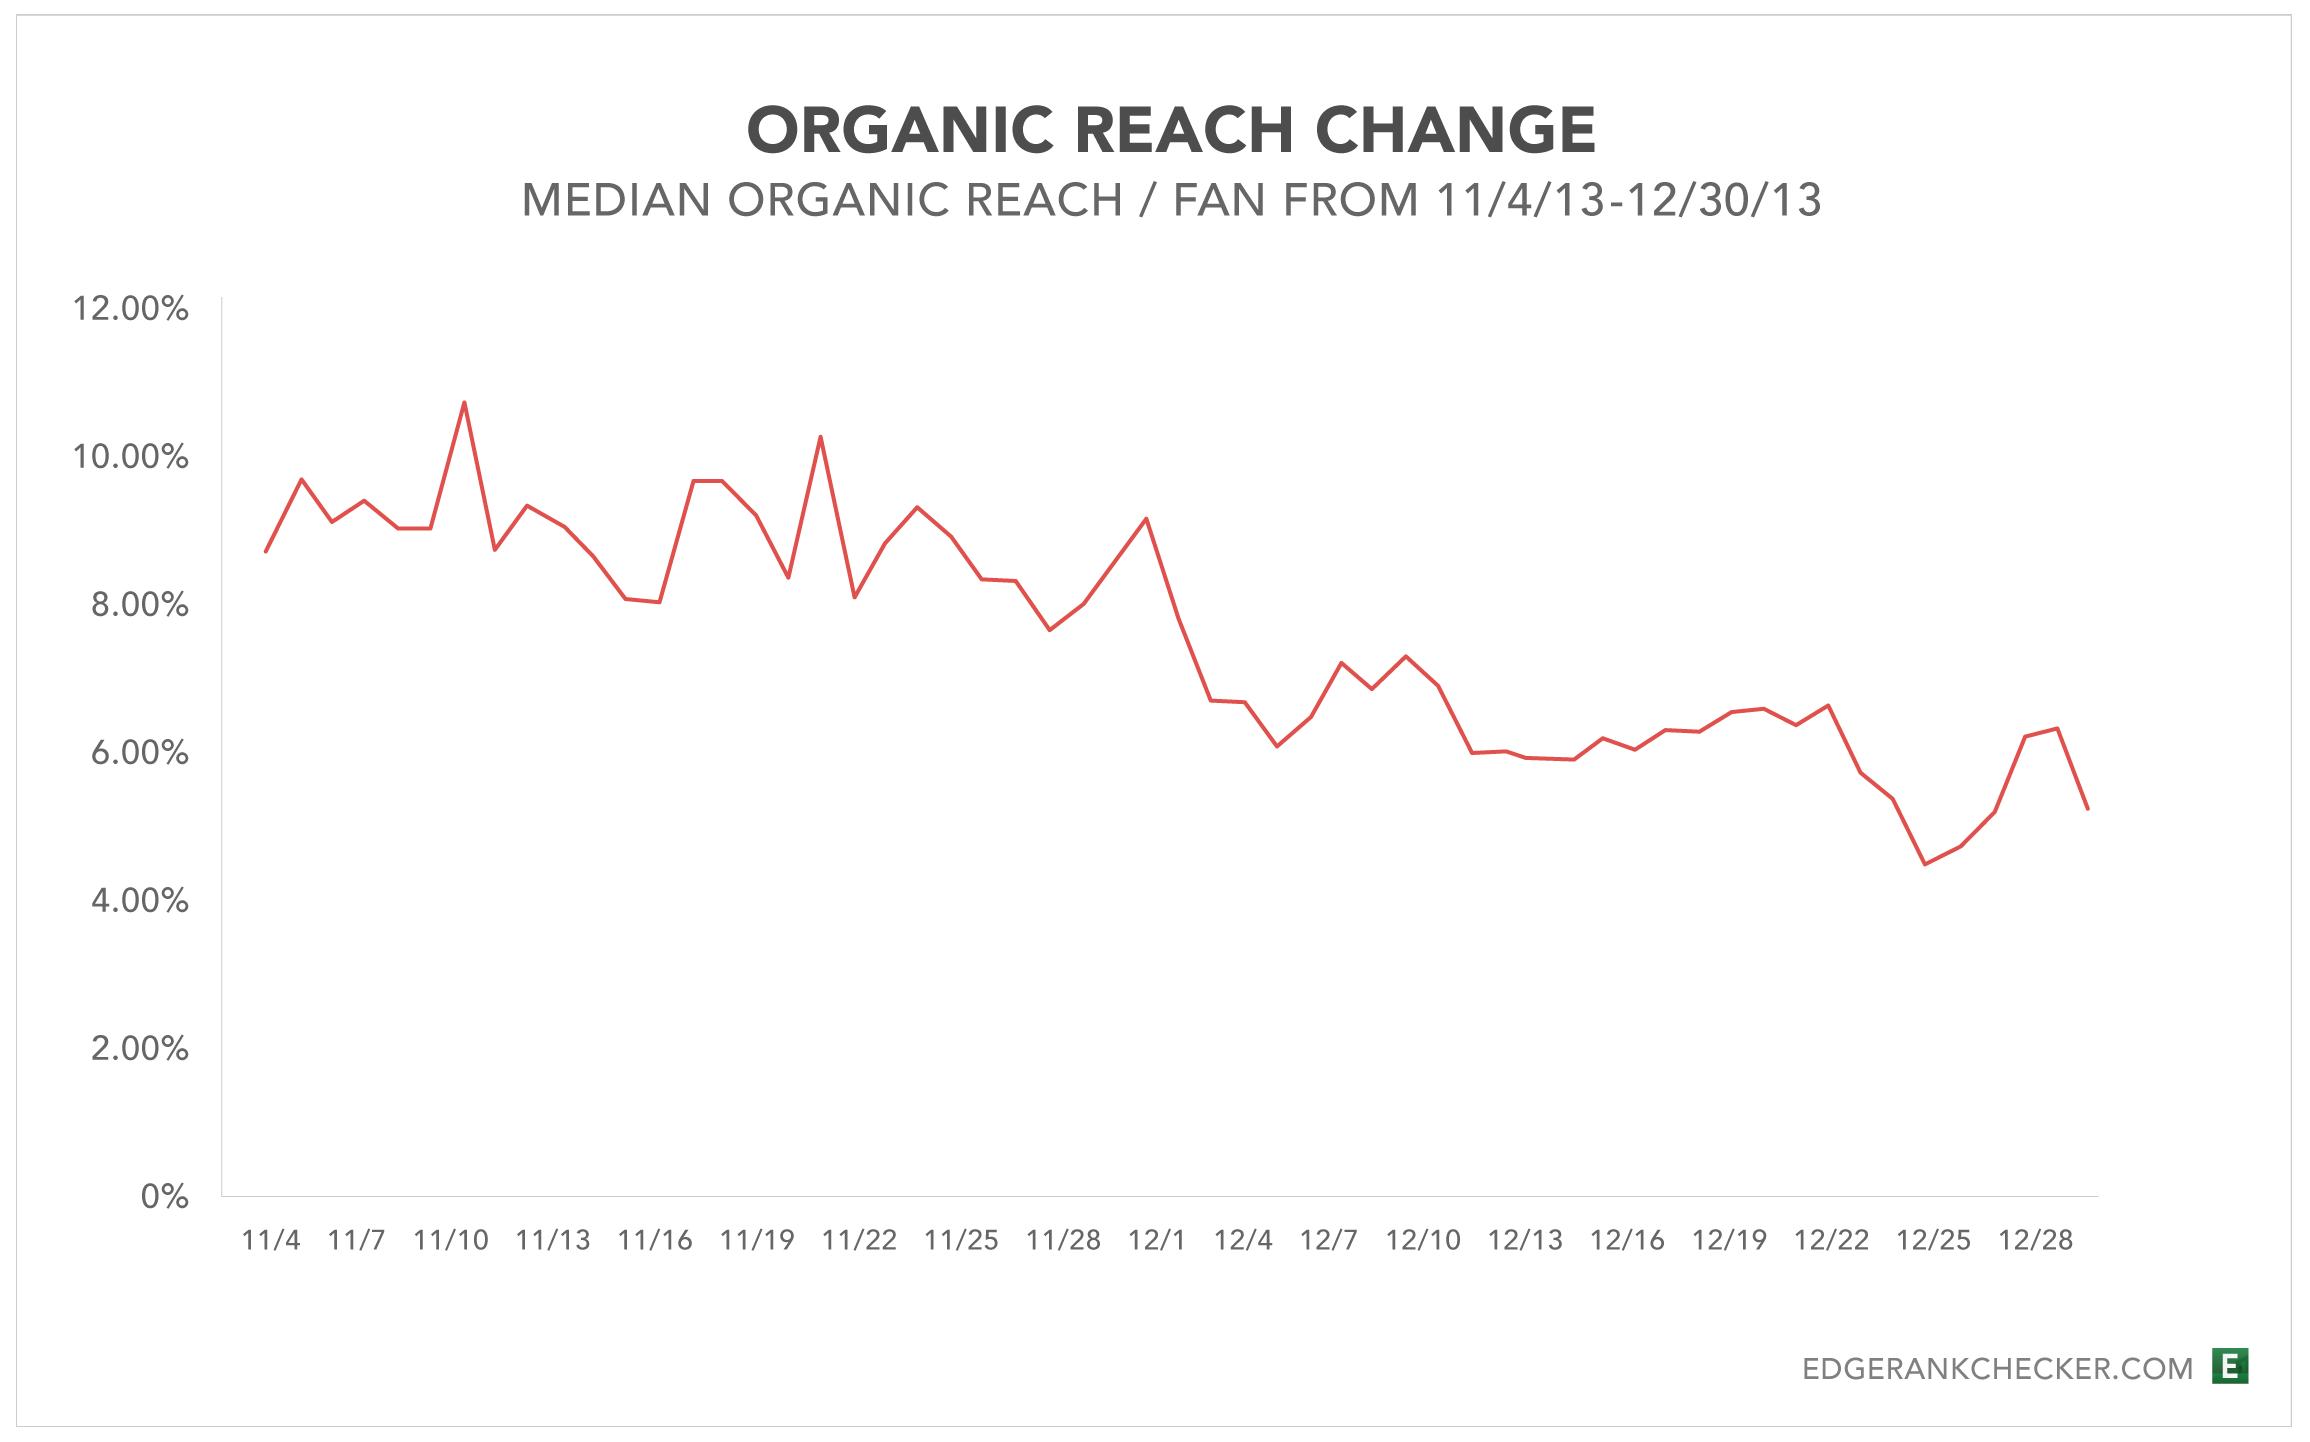 Organic reach change